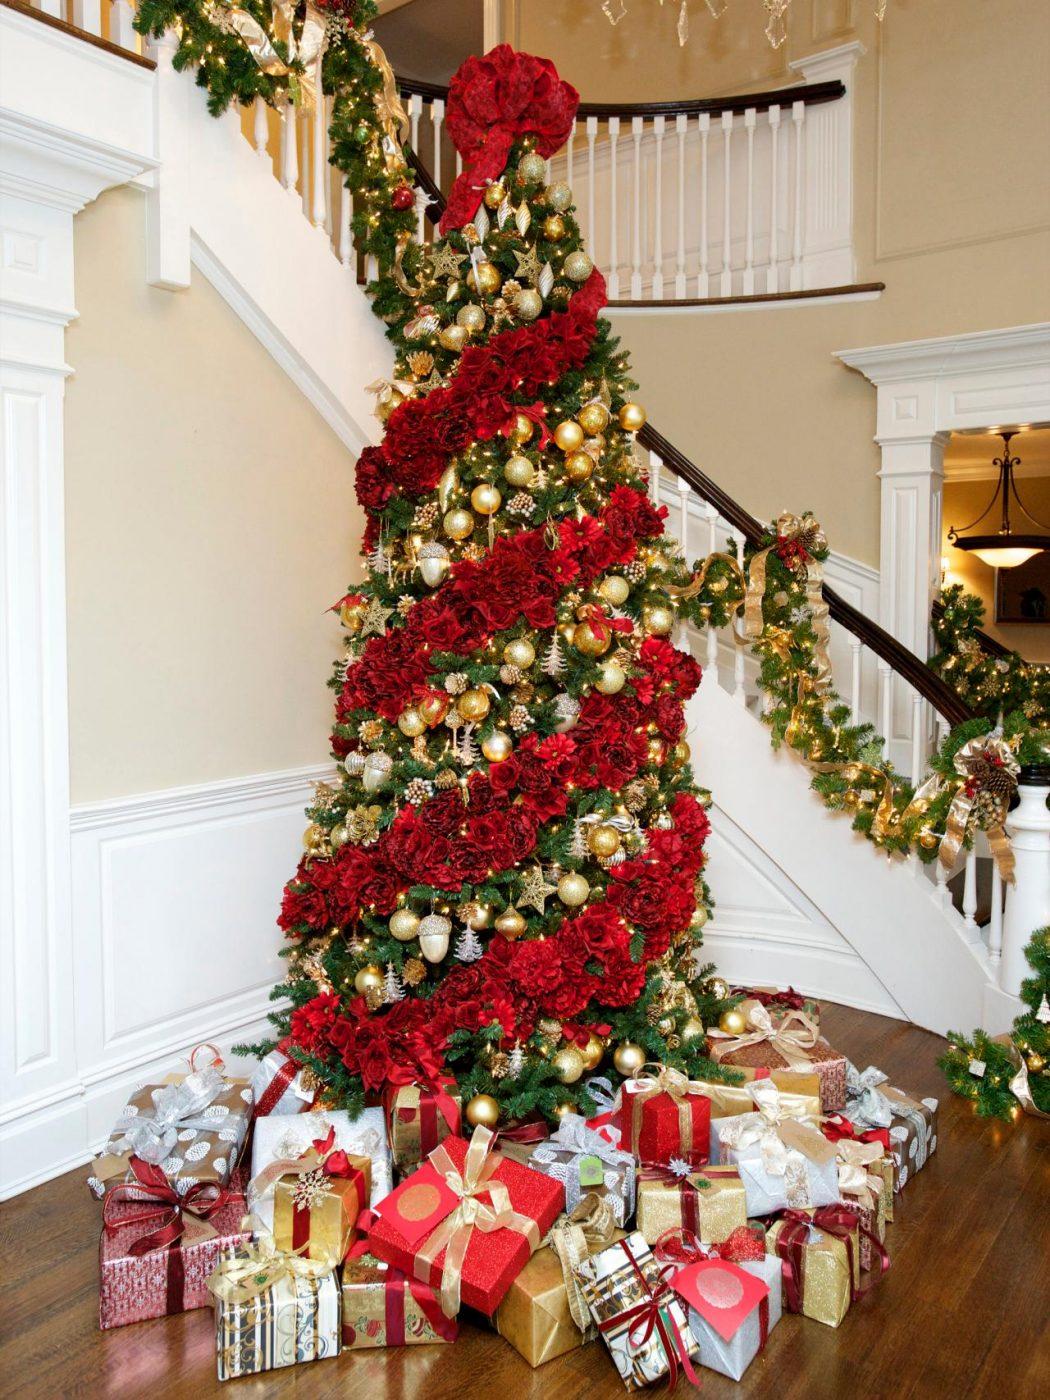 Top 10 Christmas Decoration Ideas & Trends 2018